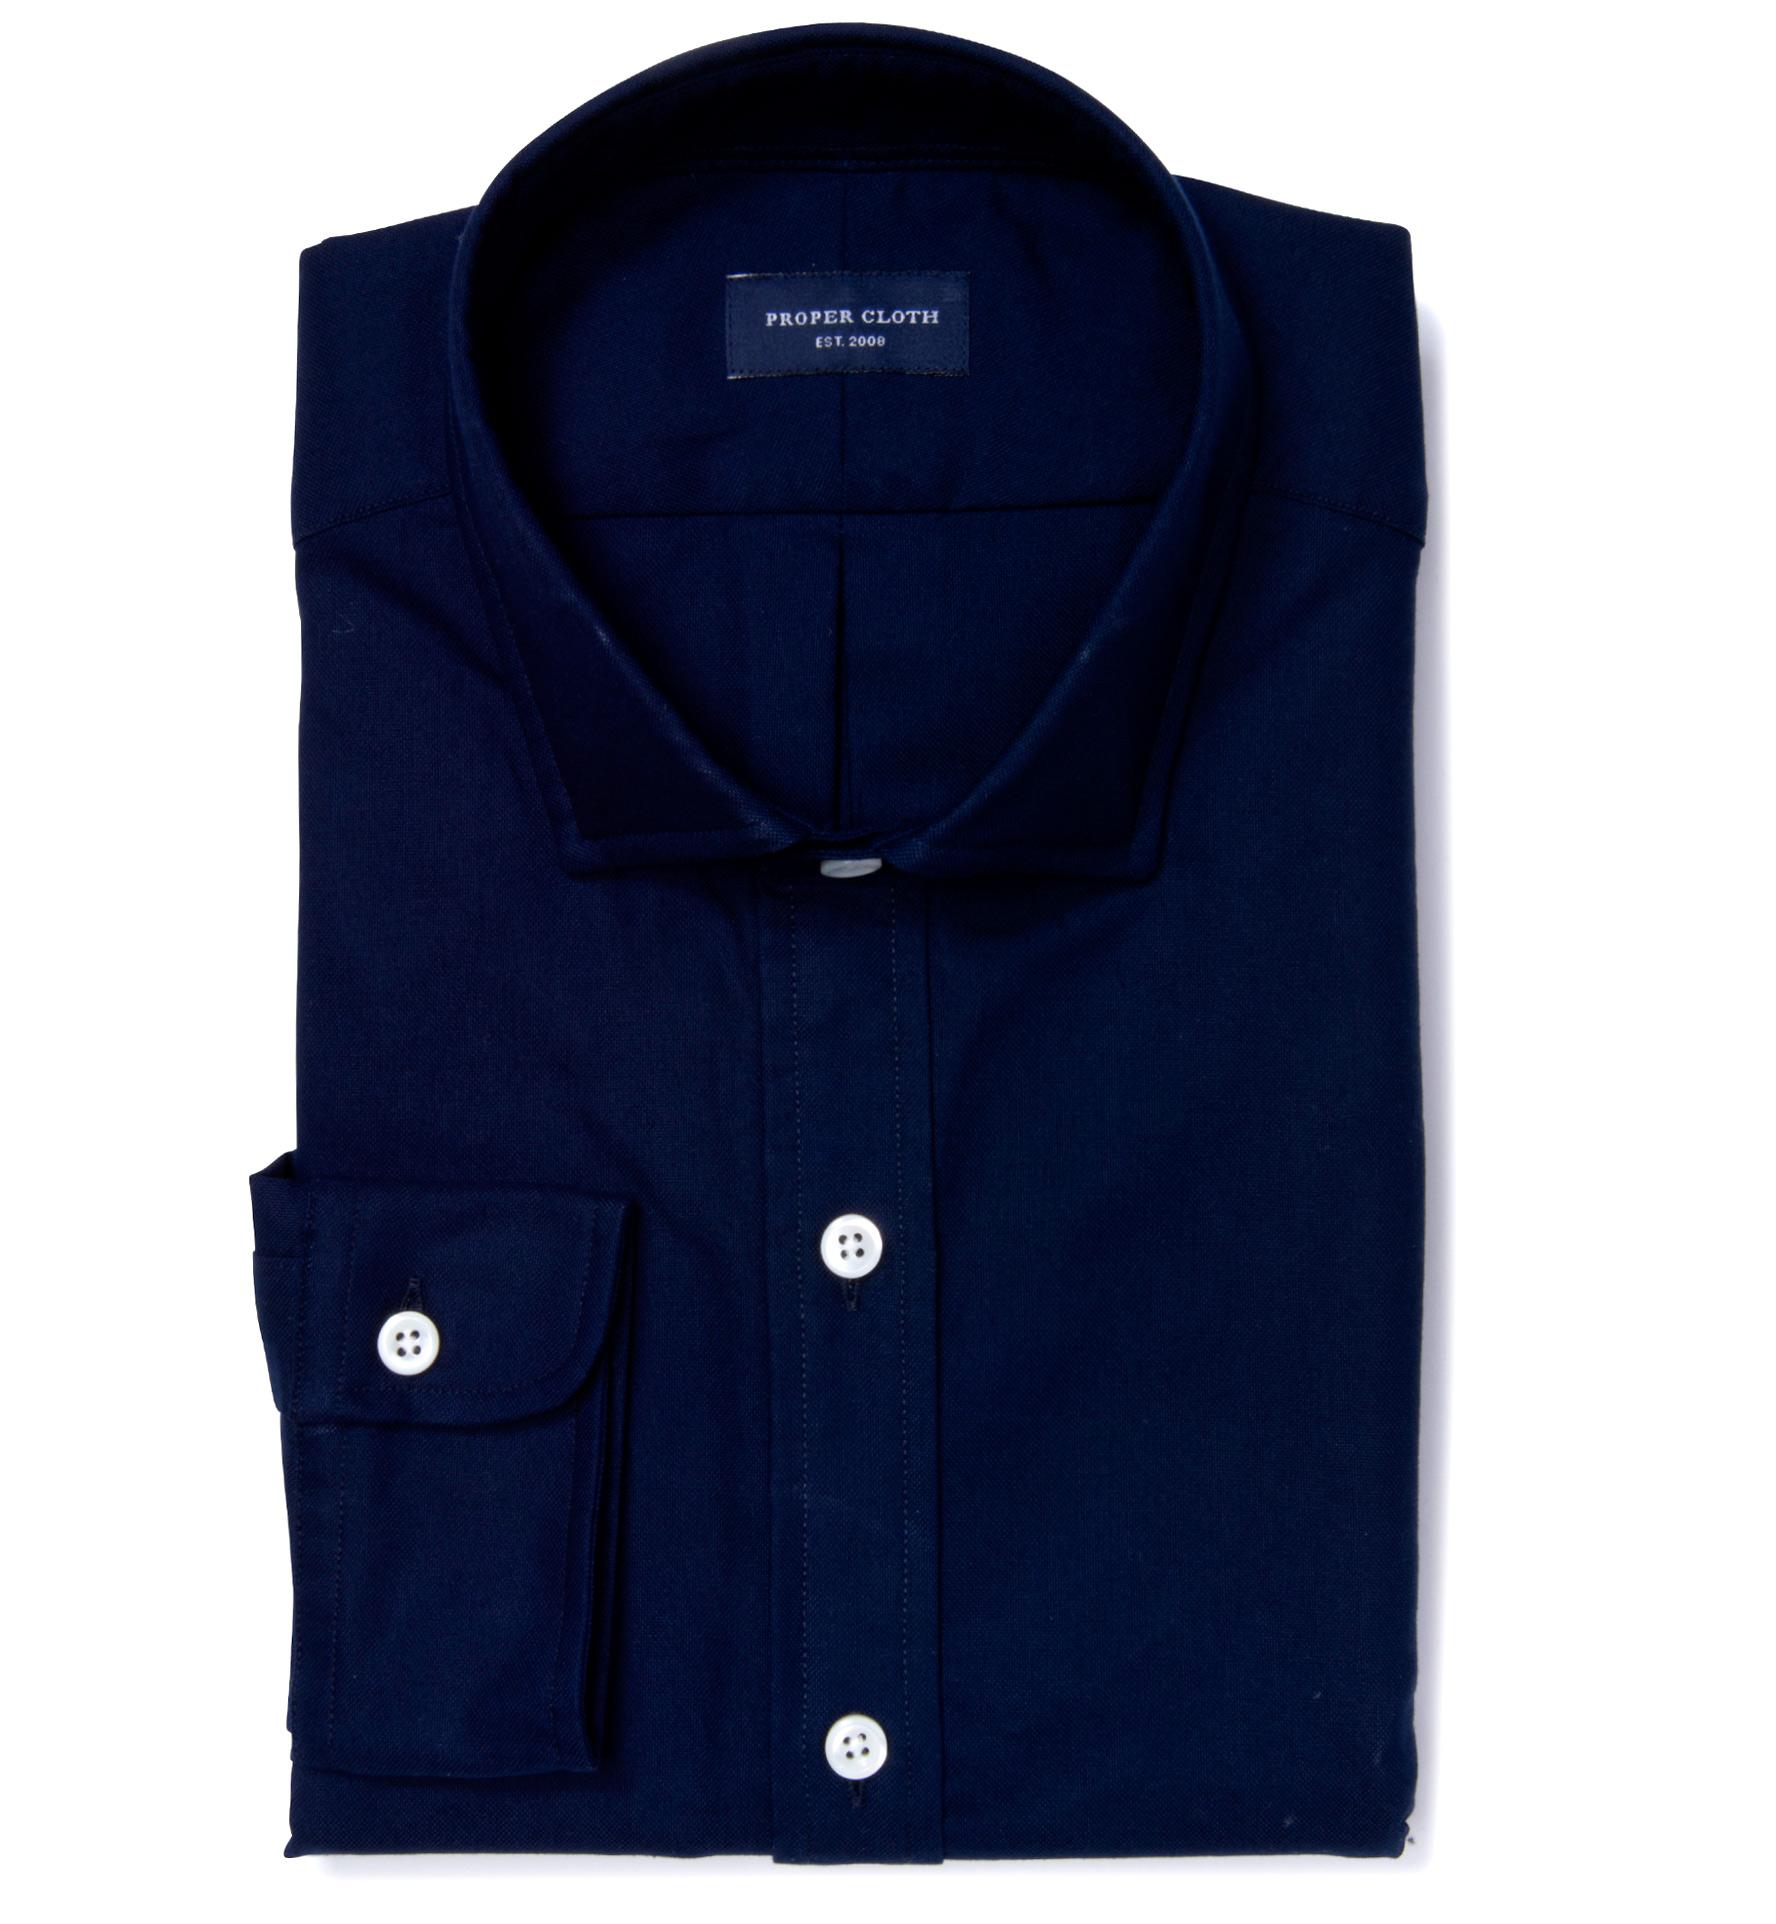 Midnight Navy Heavy Oxford Mens Dress Shirt By Proper Cloth